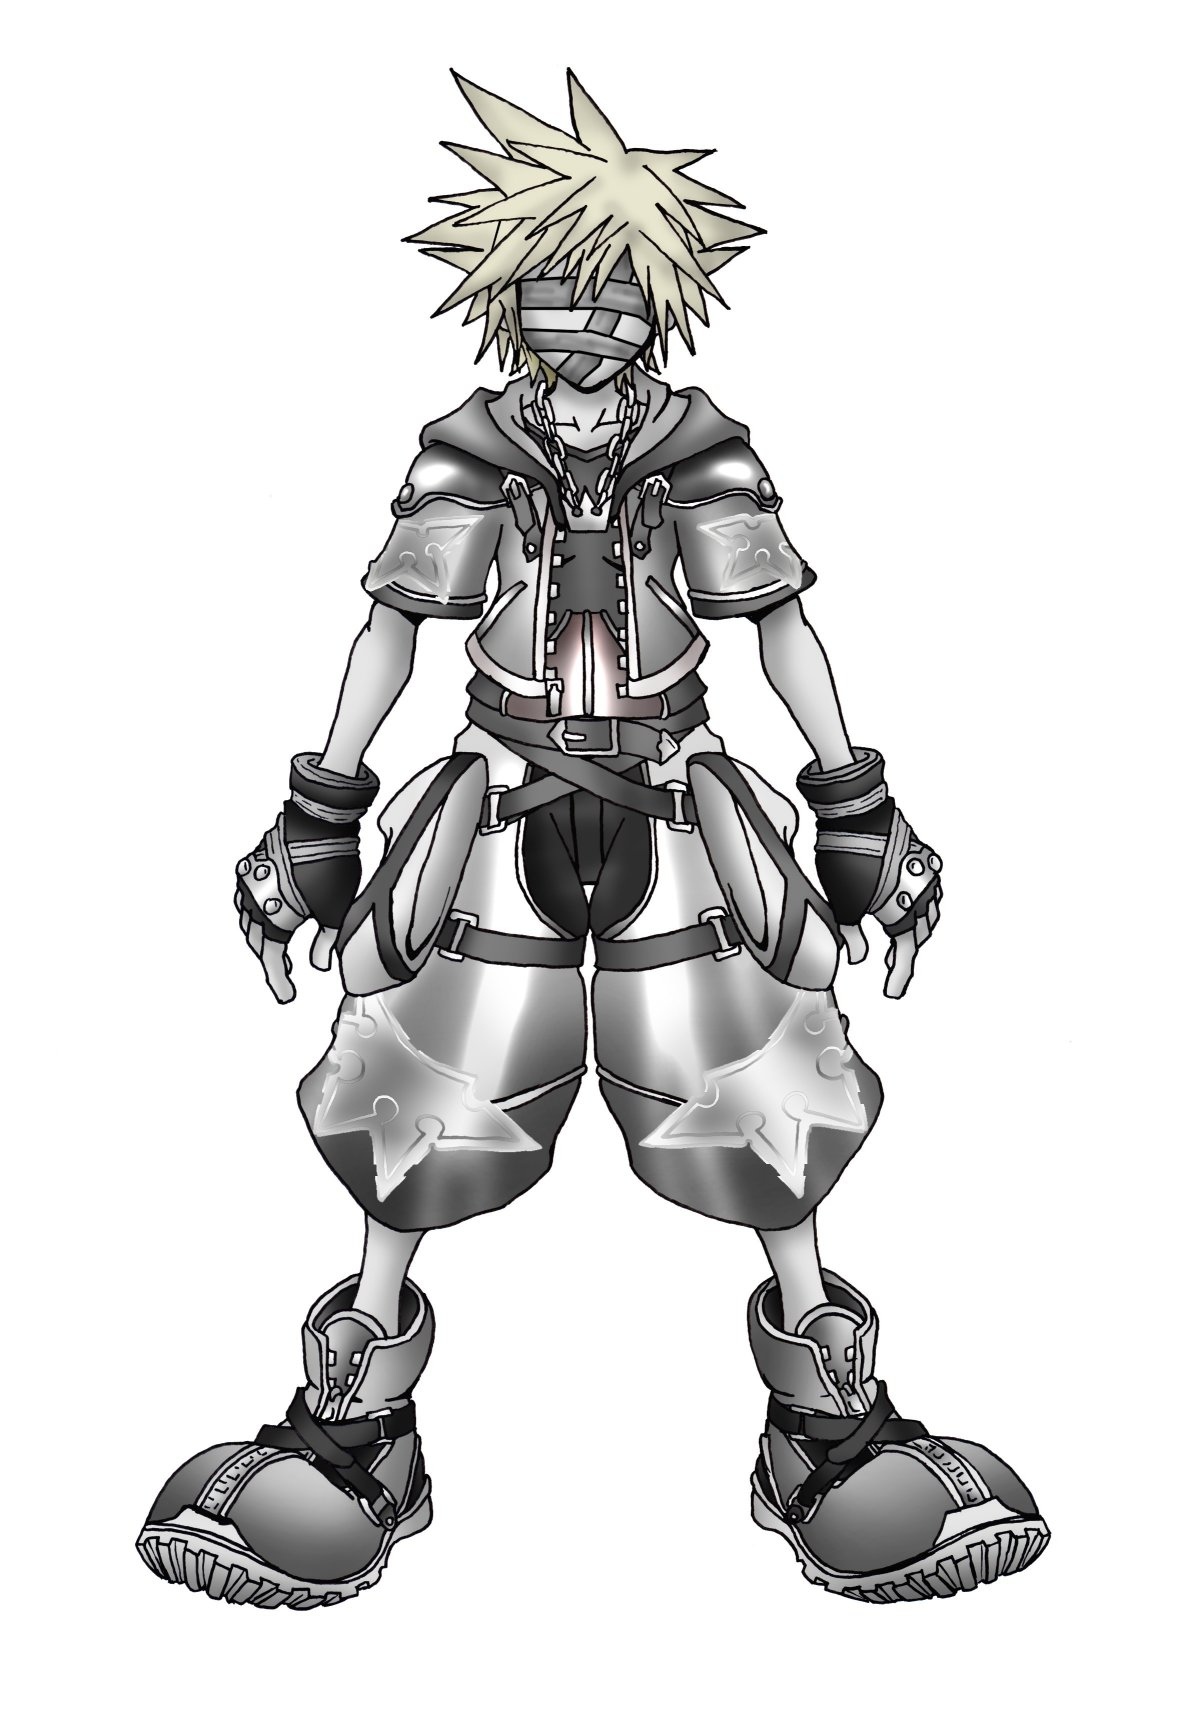 Kingdom Hearts 2 Un Form by Marduk-Kurios on DeviantArt